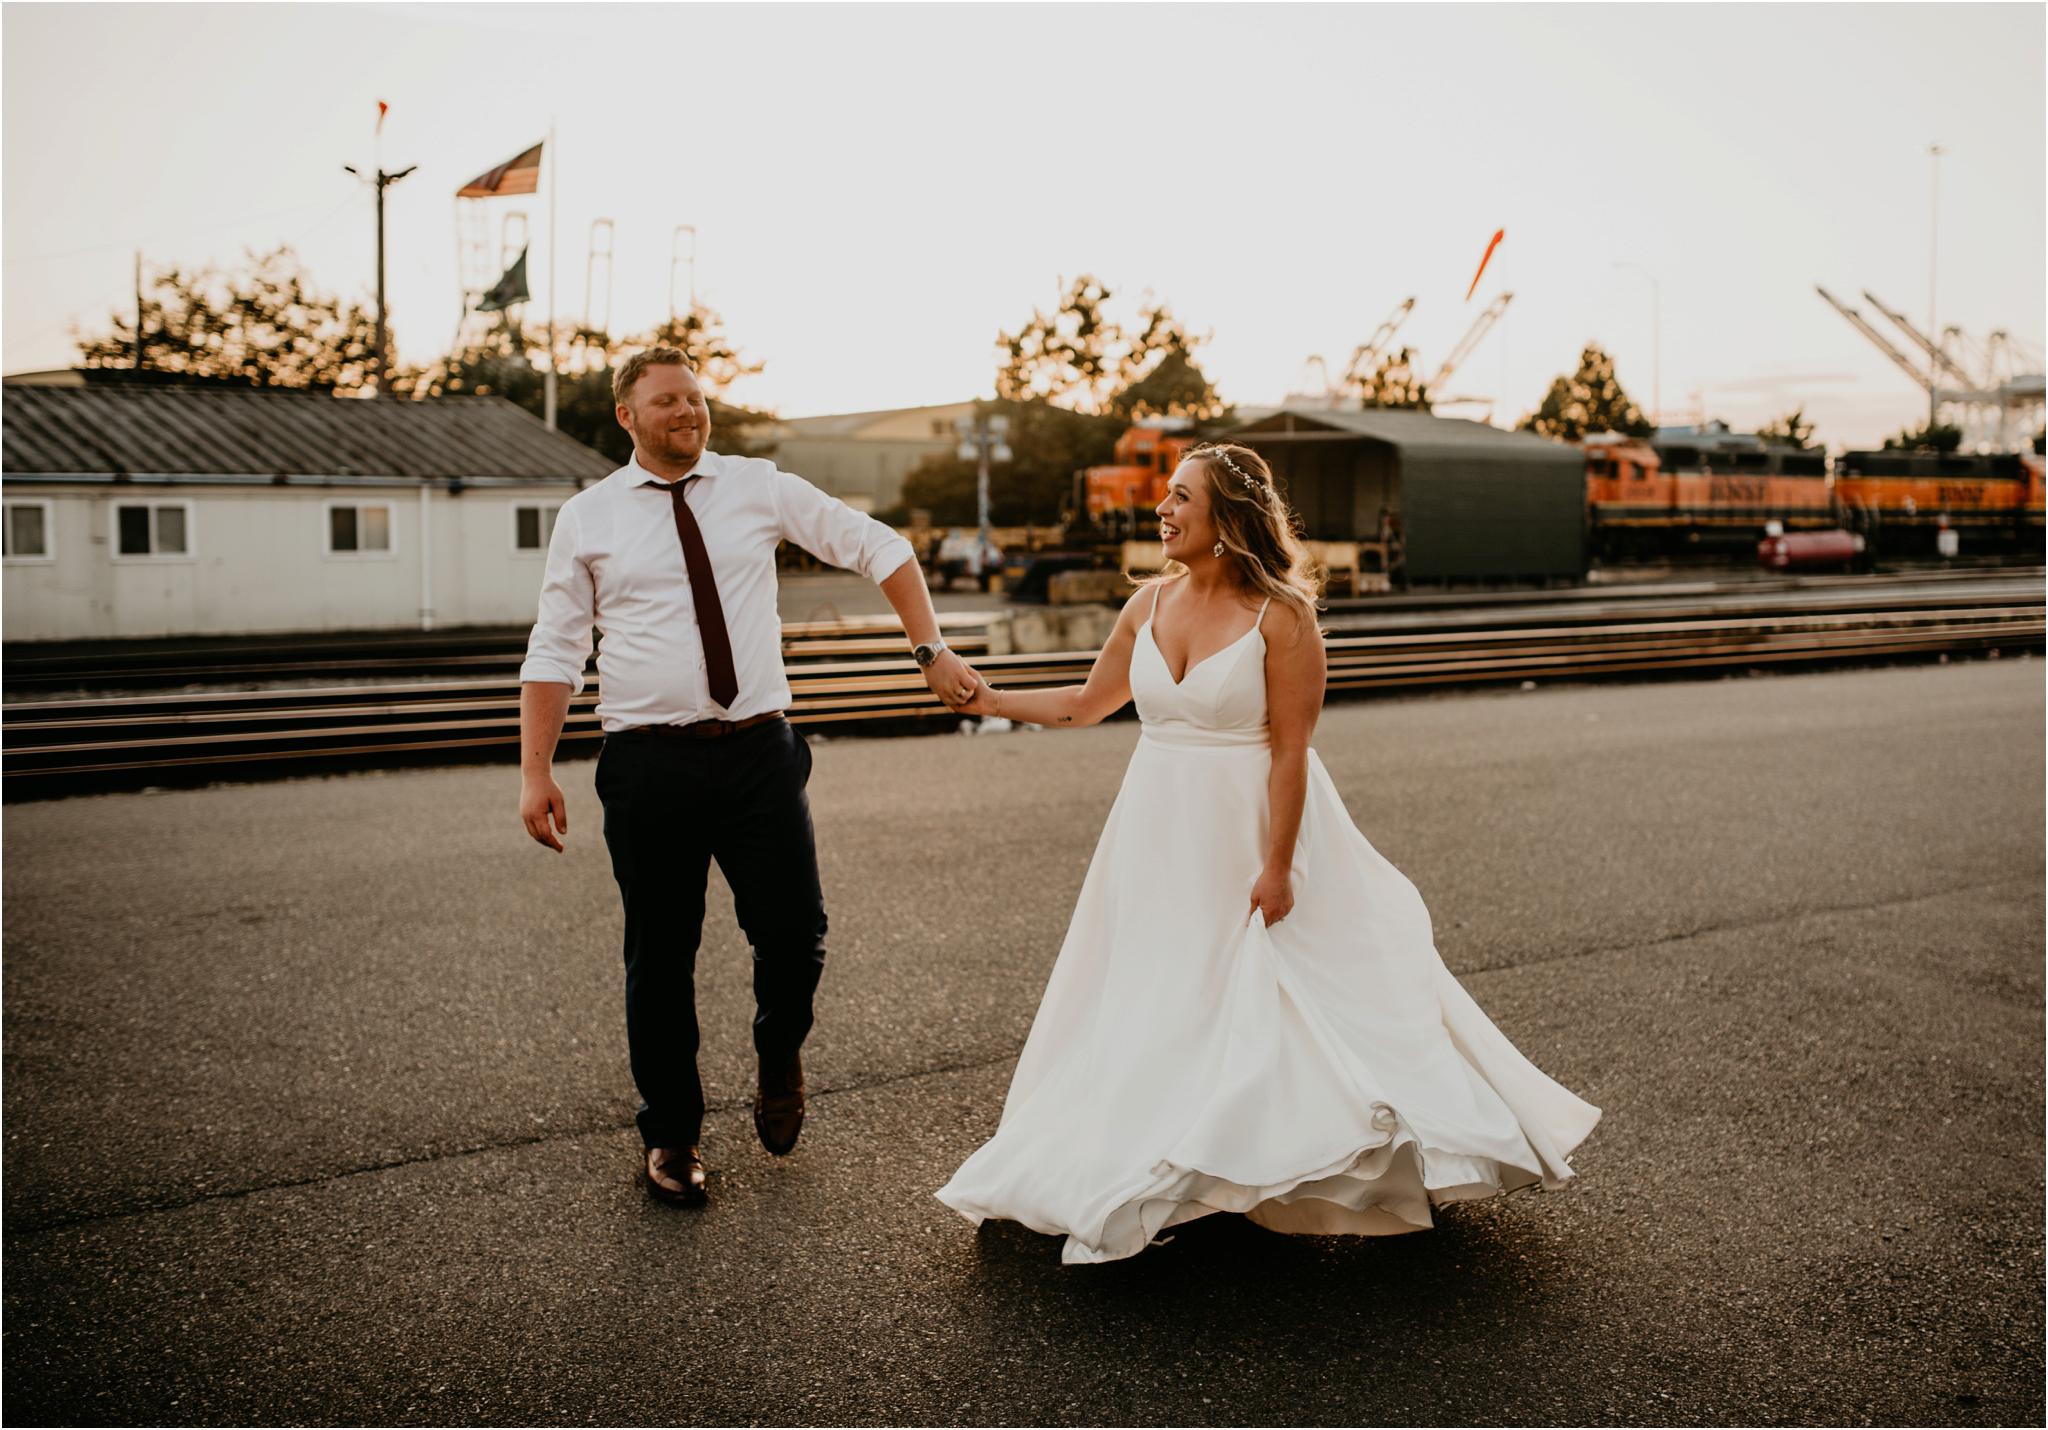 laura-and-matt-metropolist-urban-seattle-wedding-photographer-138.jpg